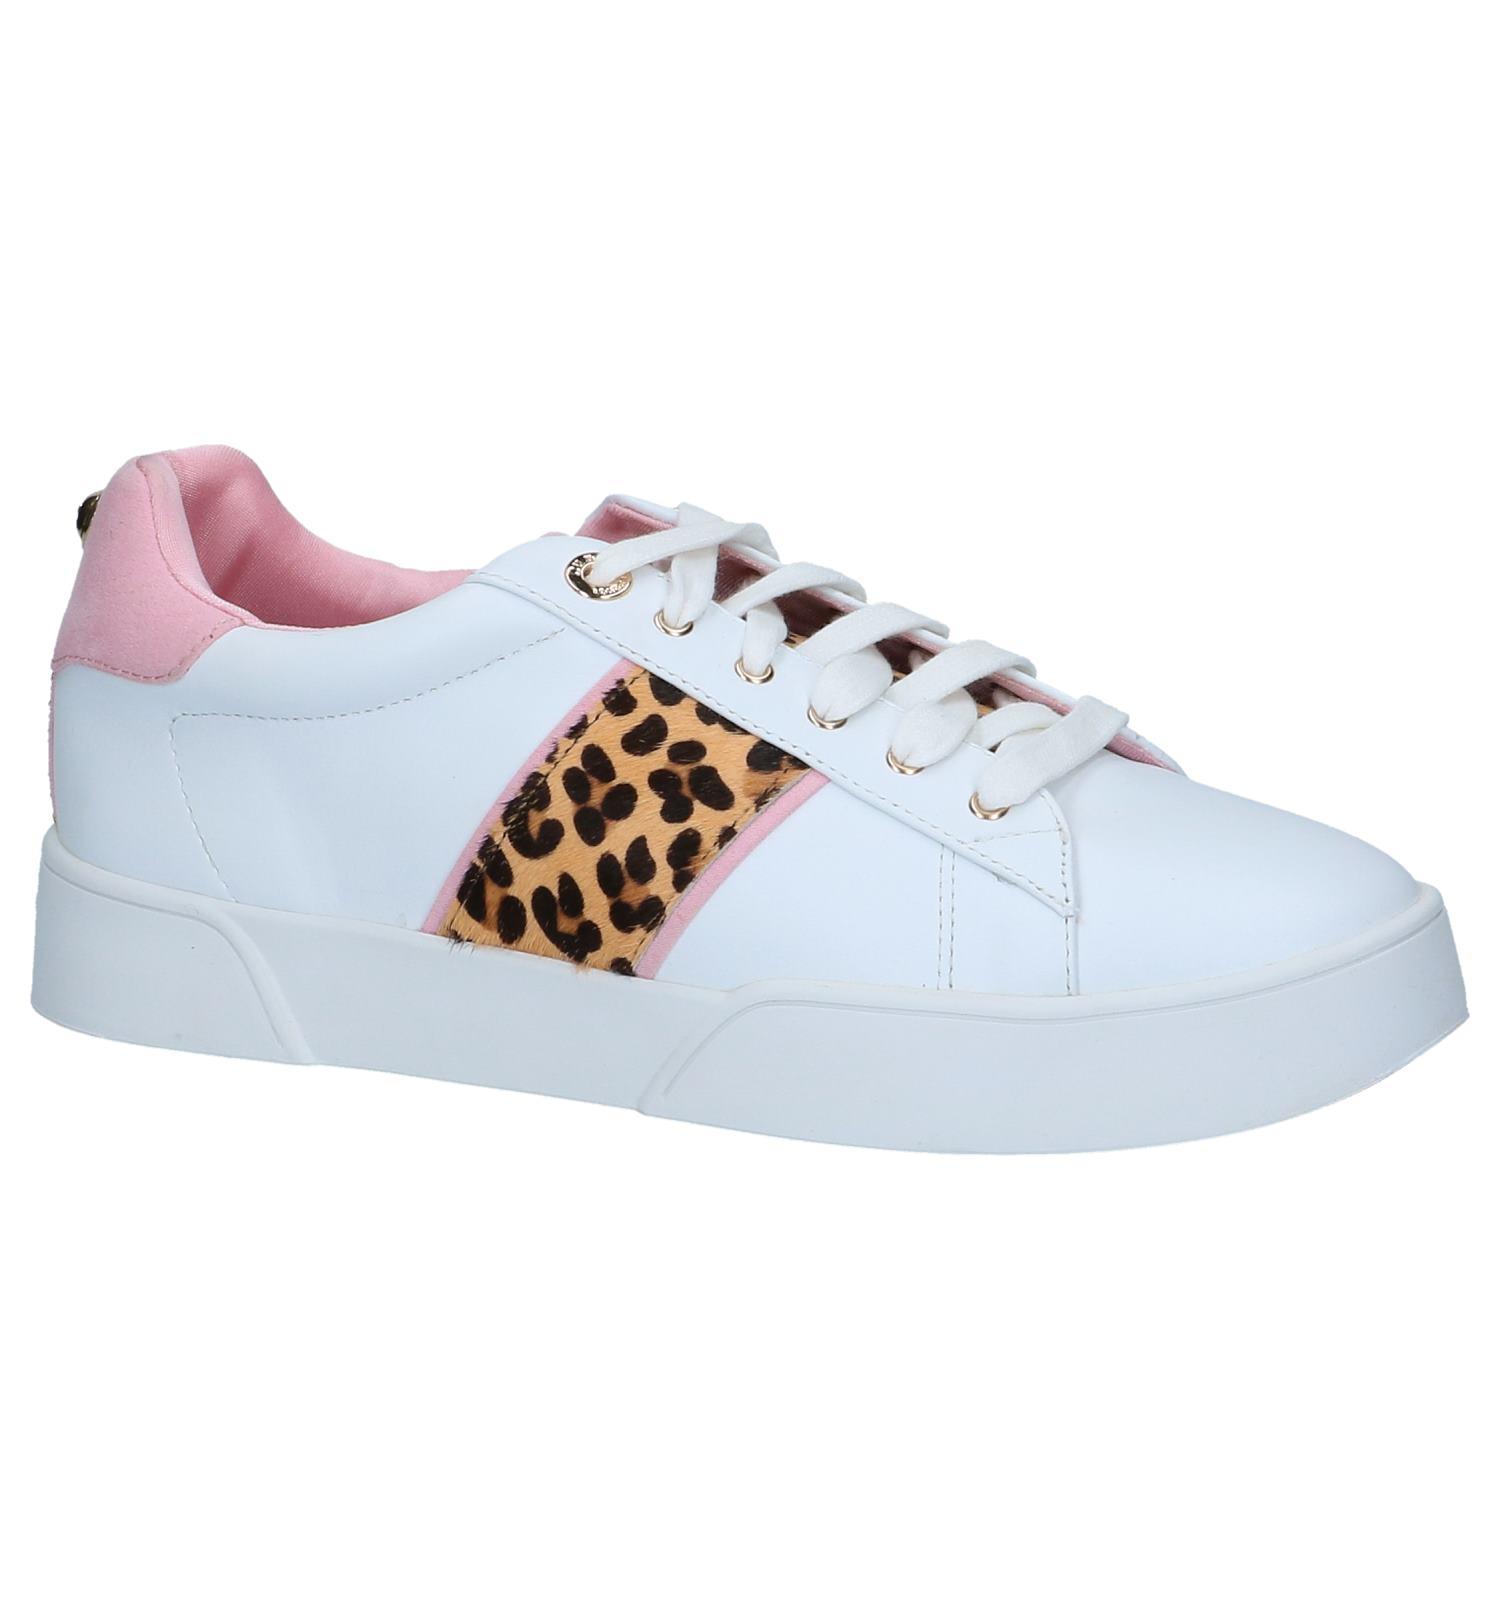 a7287ab5cc4 Witte Sneakers Dune Elsie | TORFS.BE | Gratis verzend en retour